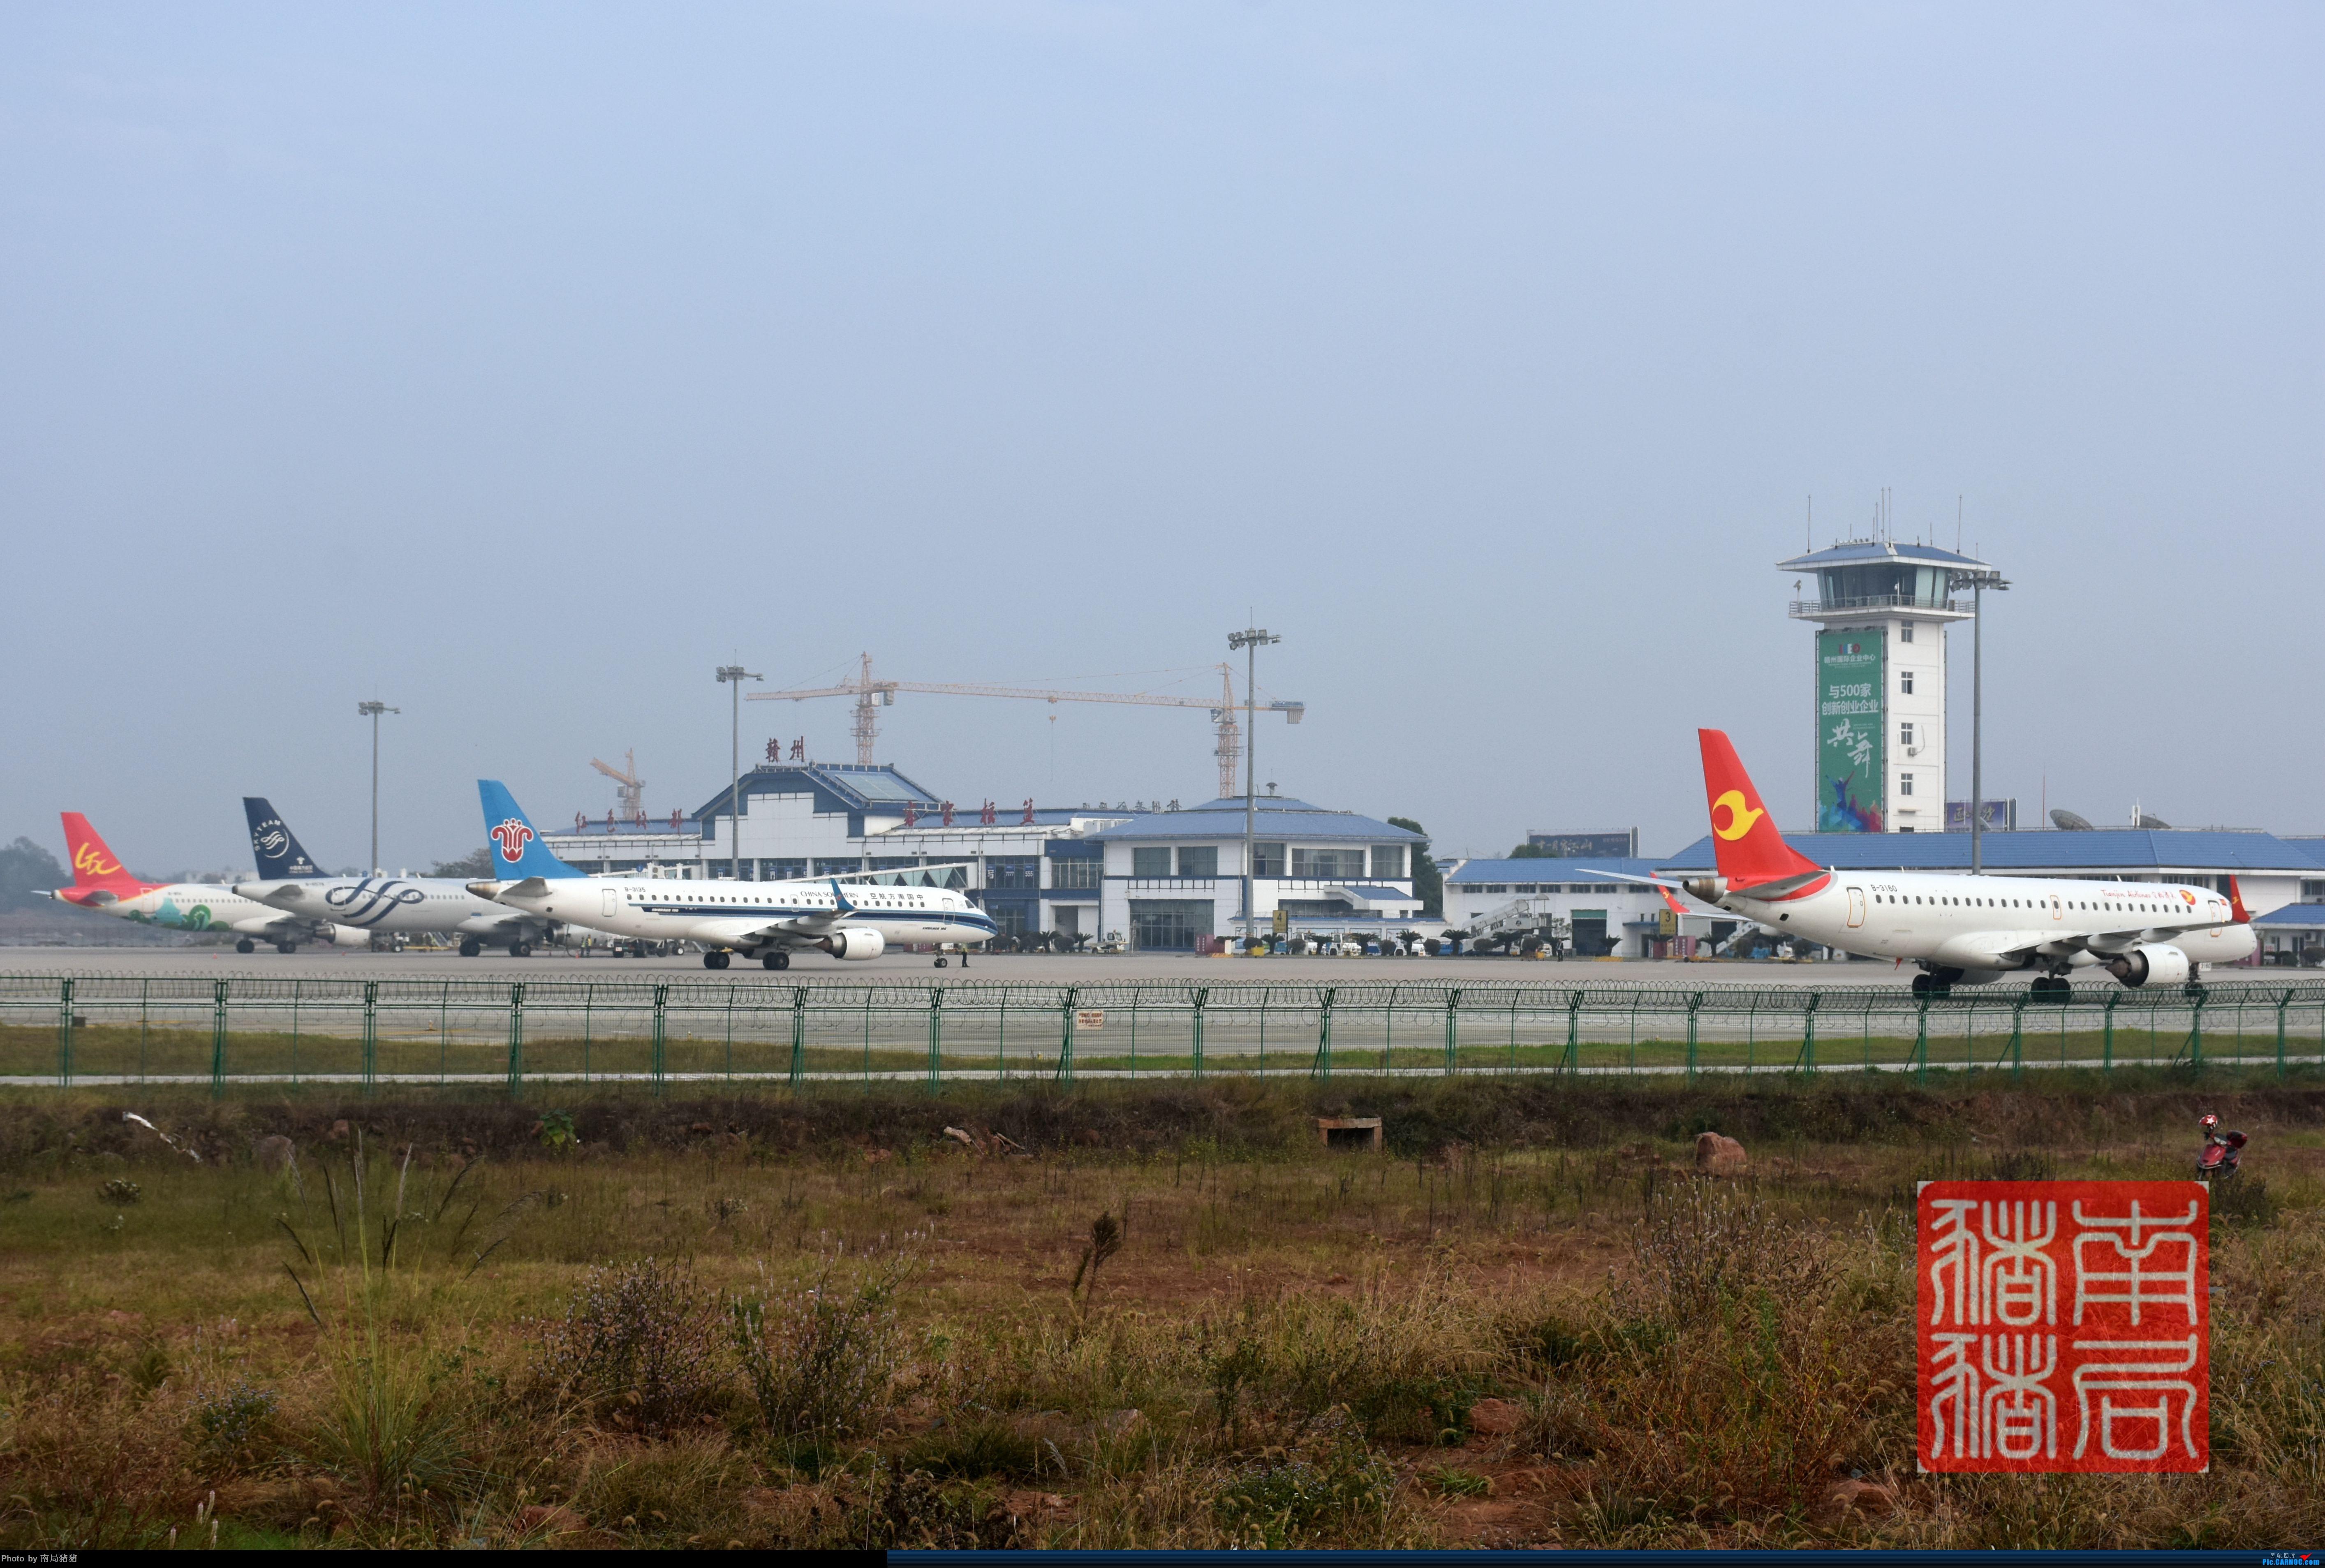 Re:KOW赣州黄金机场(Ufly,绿城南宁,南航天合)